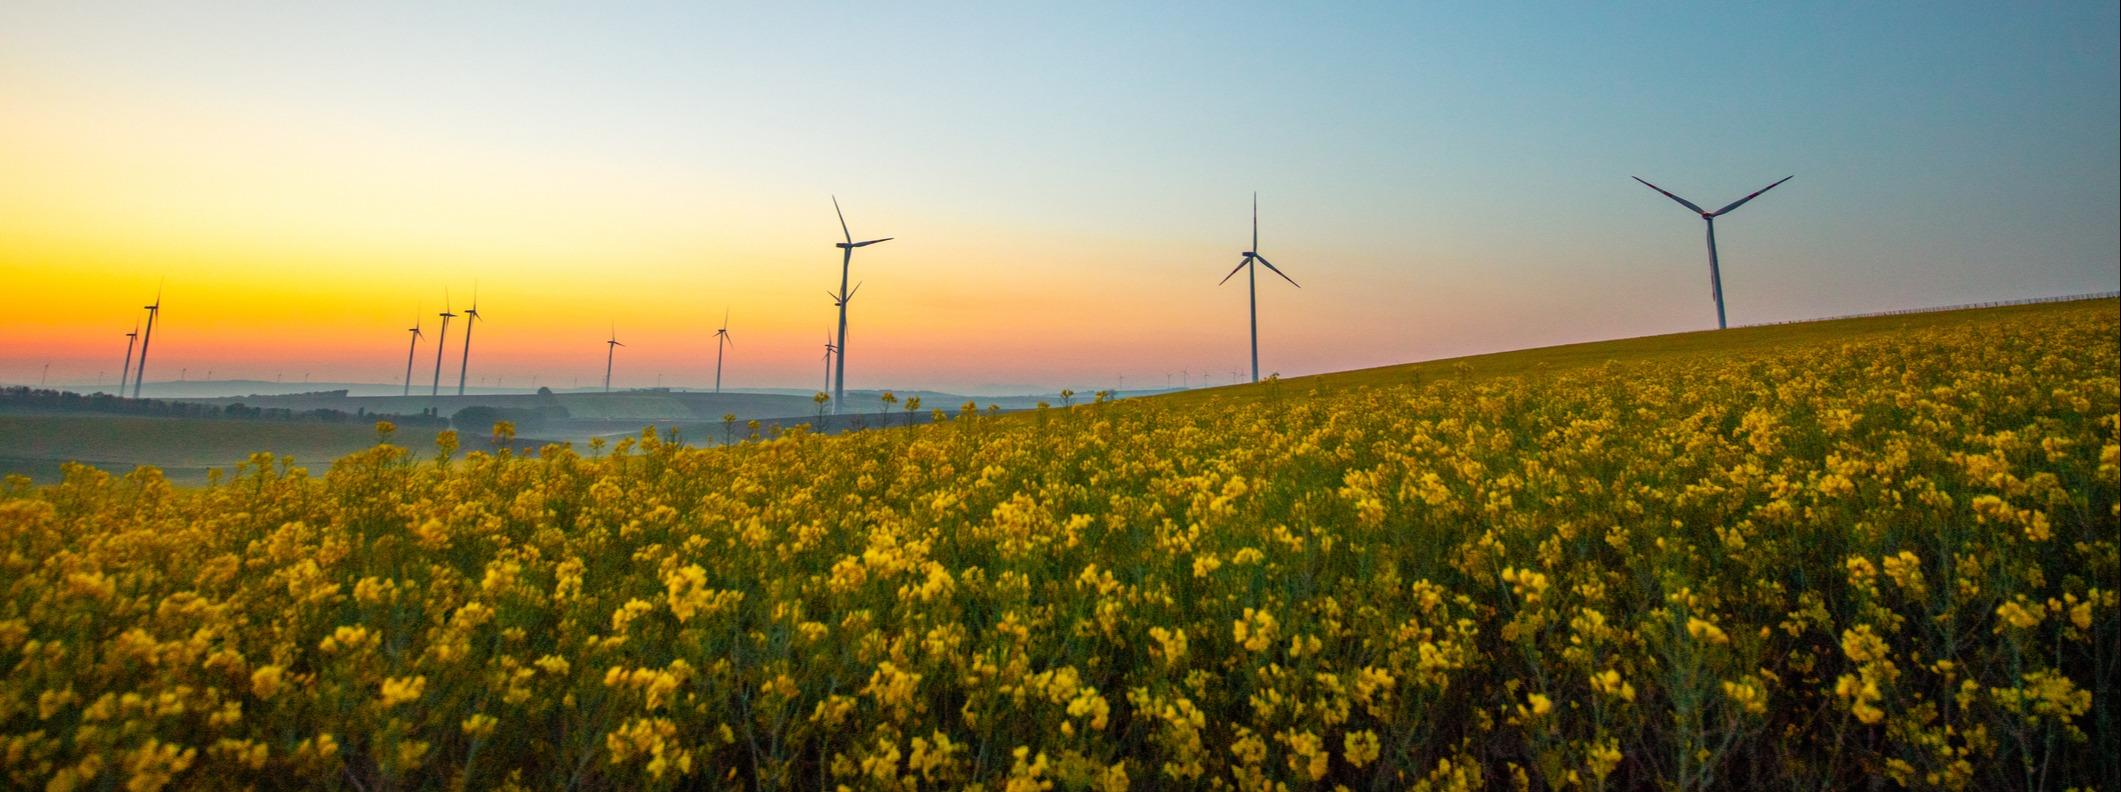 Electronics for energy industry - windmills